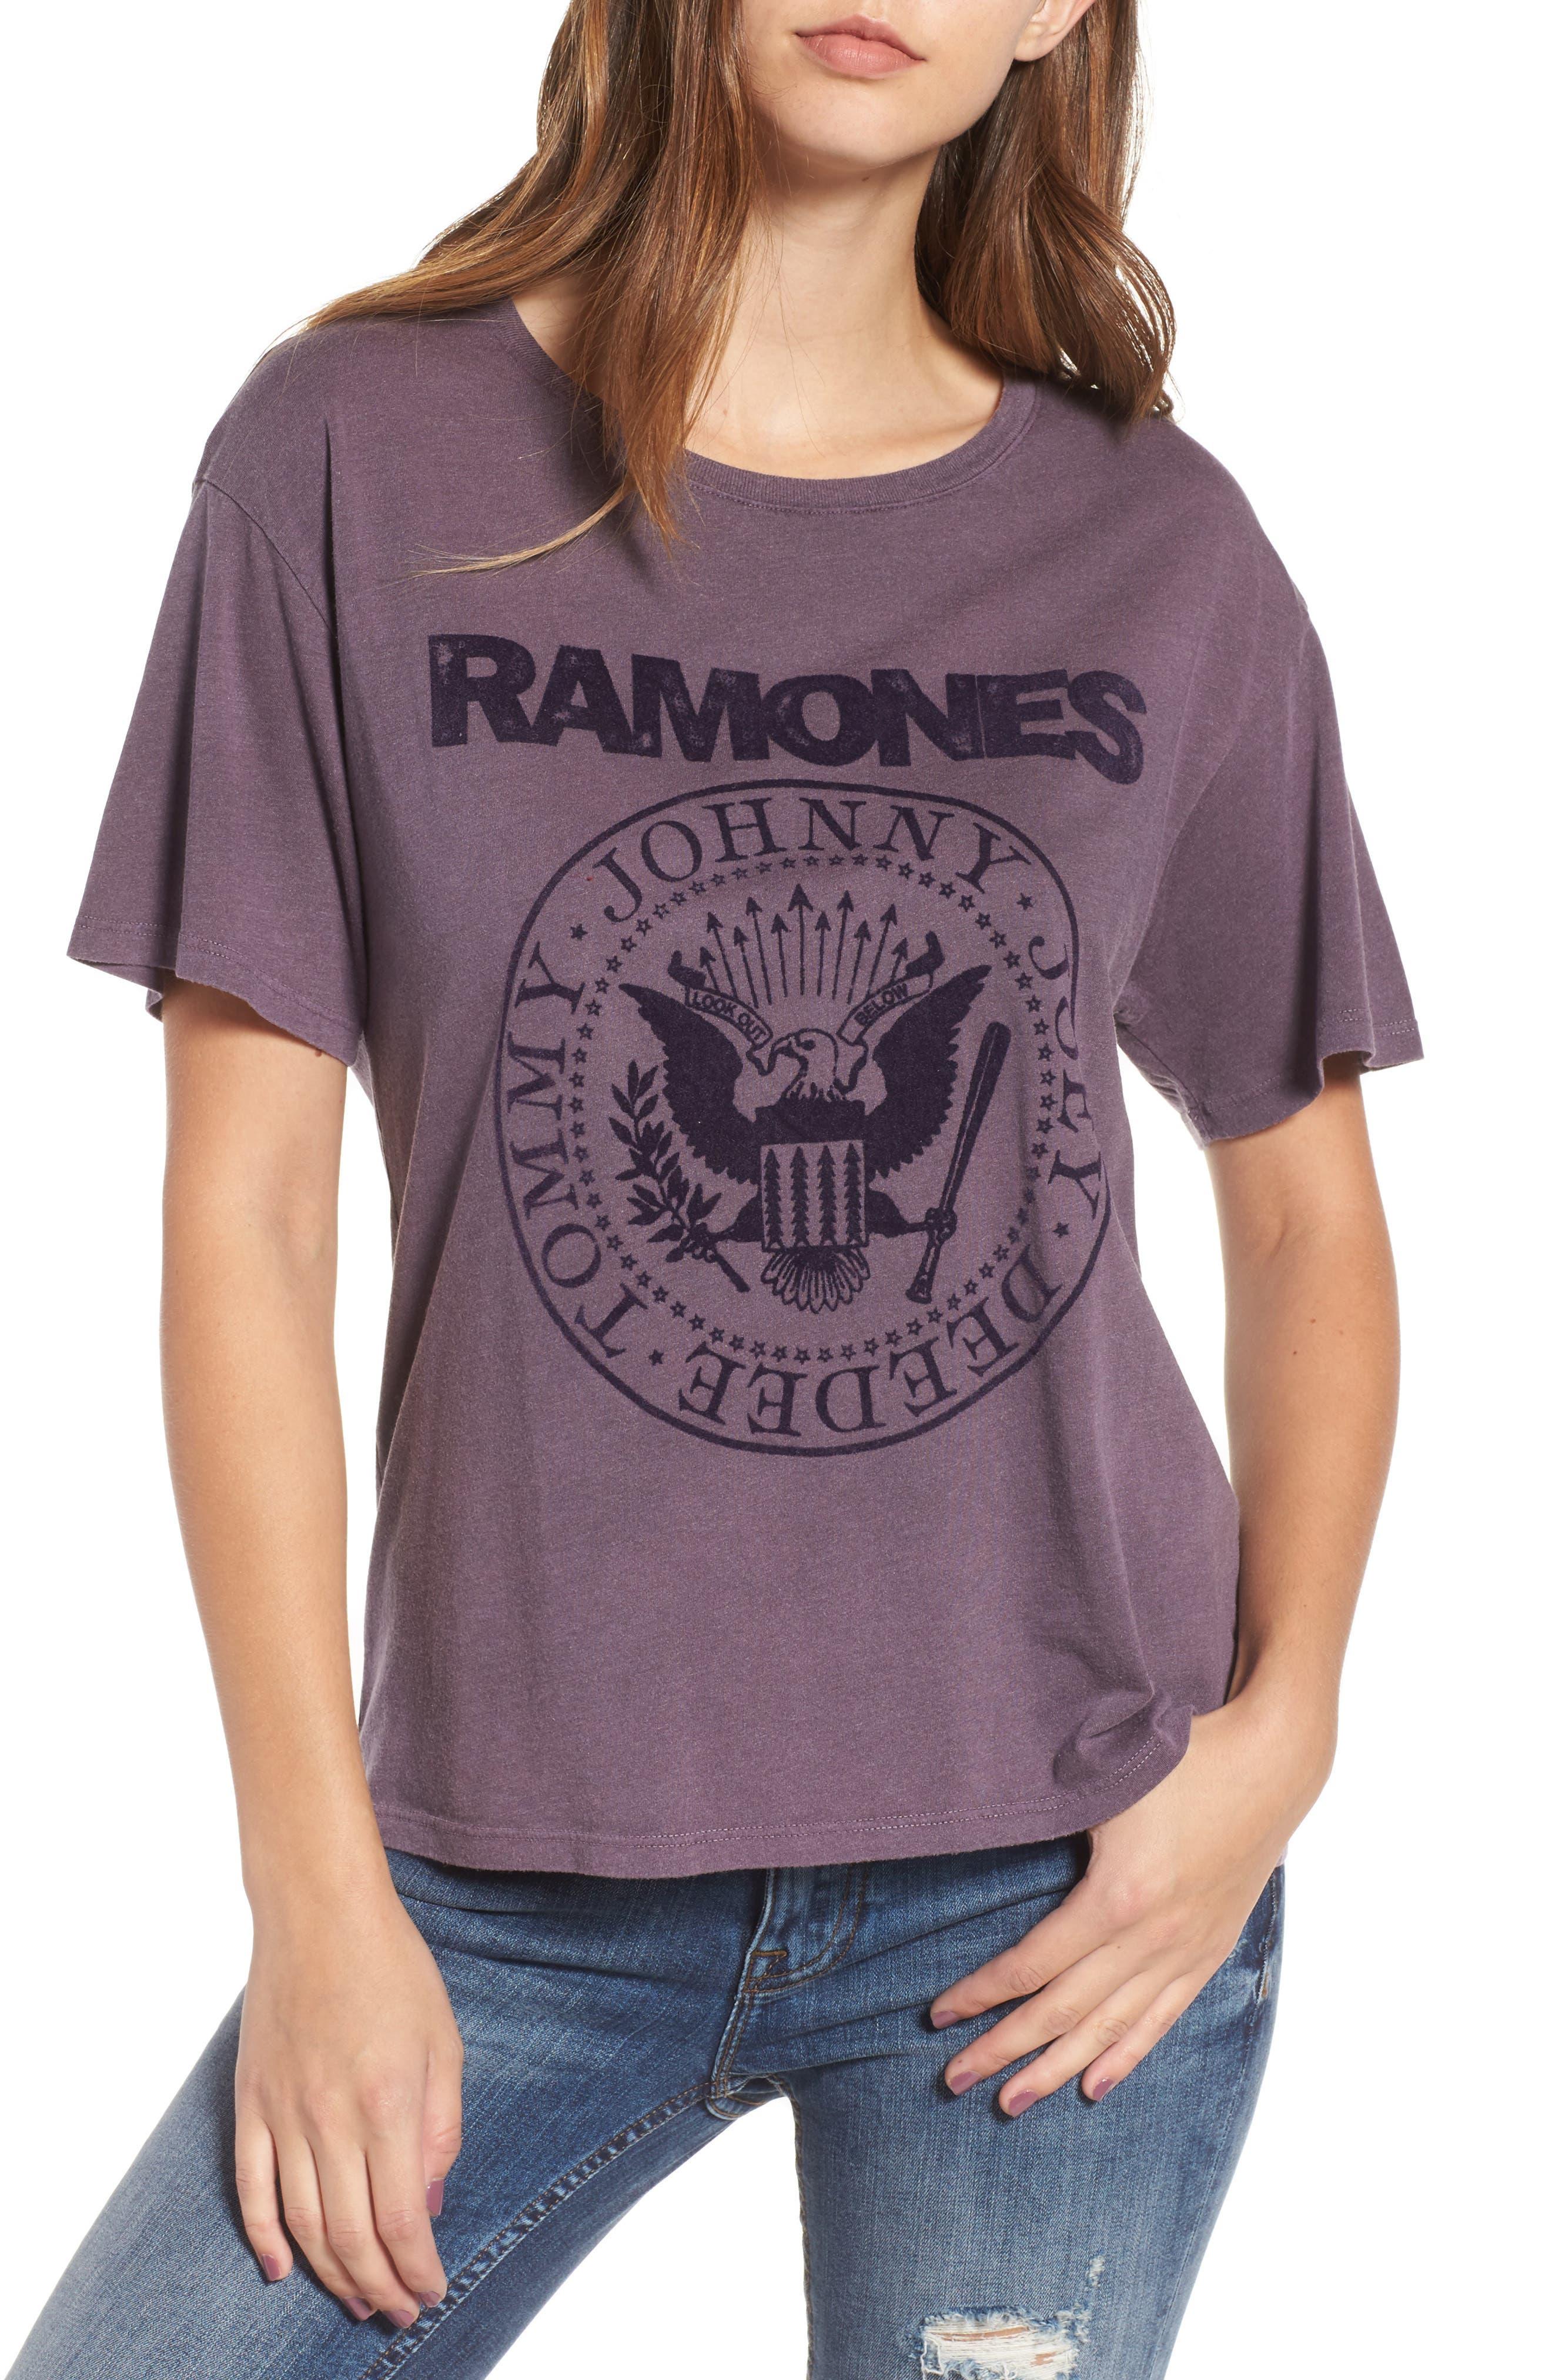 Main Image - Daydreamer Ramones Tee